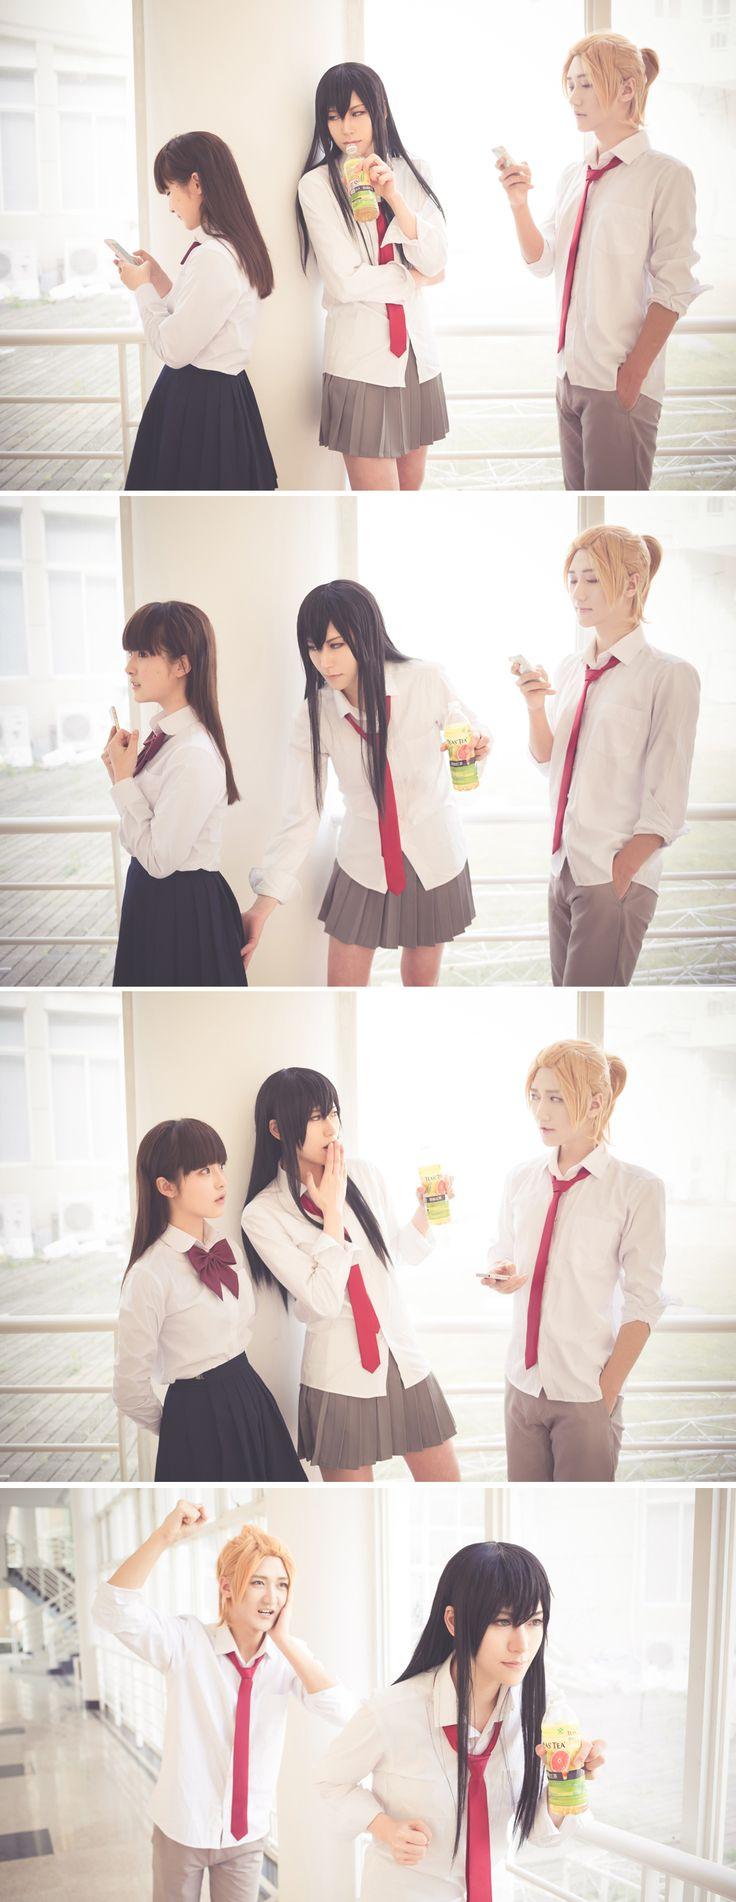 BAOZI and HANA(包子 & HANA) Qi Fang, Ayuhang(Ayu绗) Sun Jing Cosplay Photo - WorldCosplay